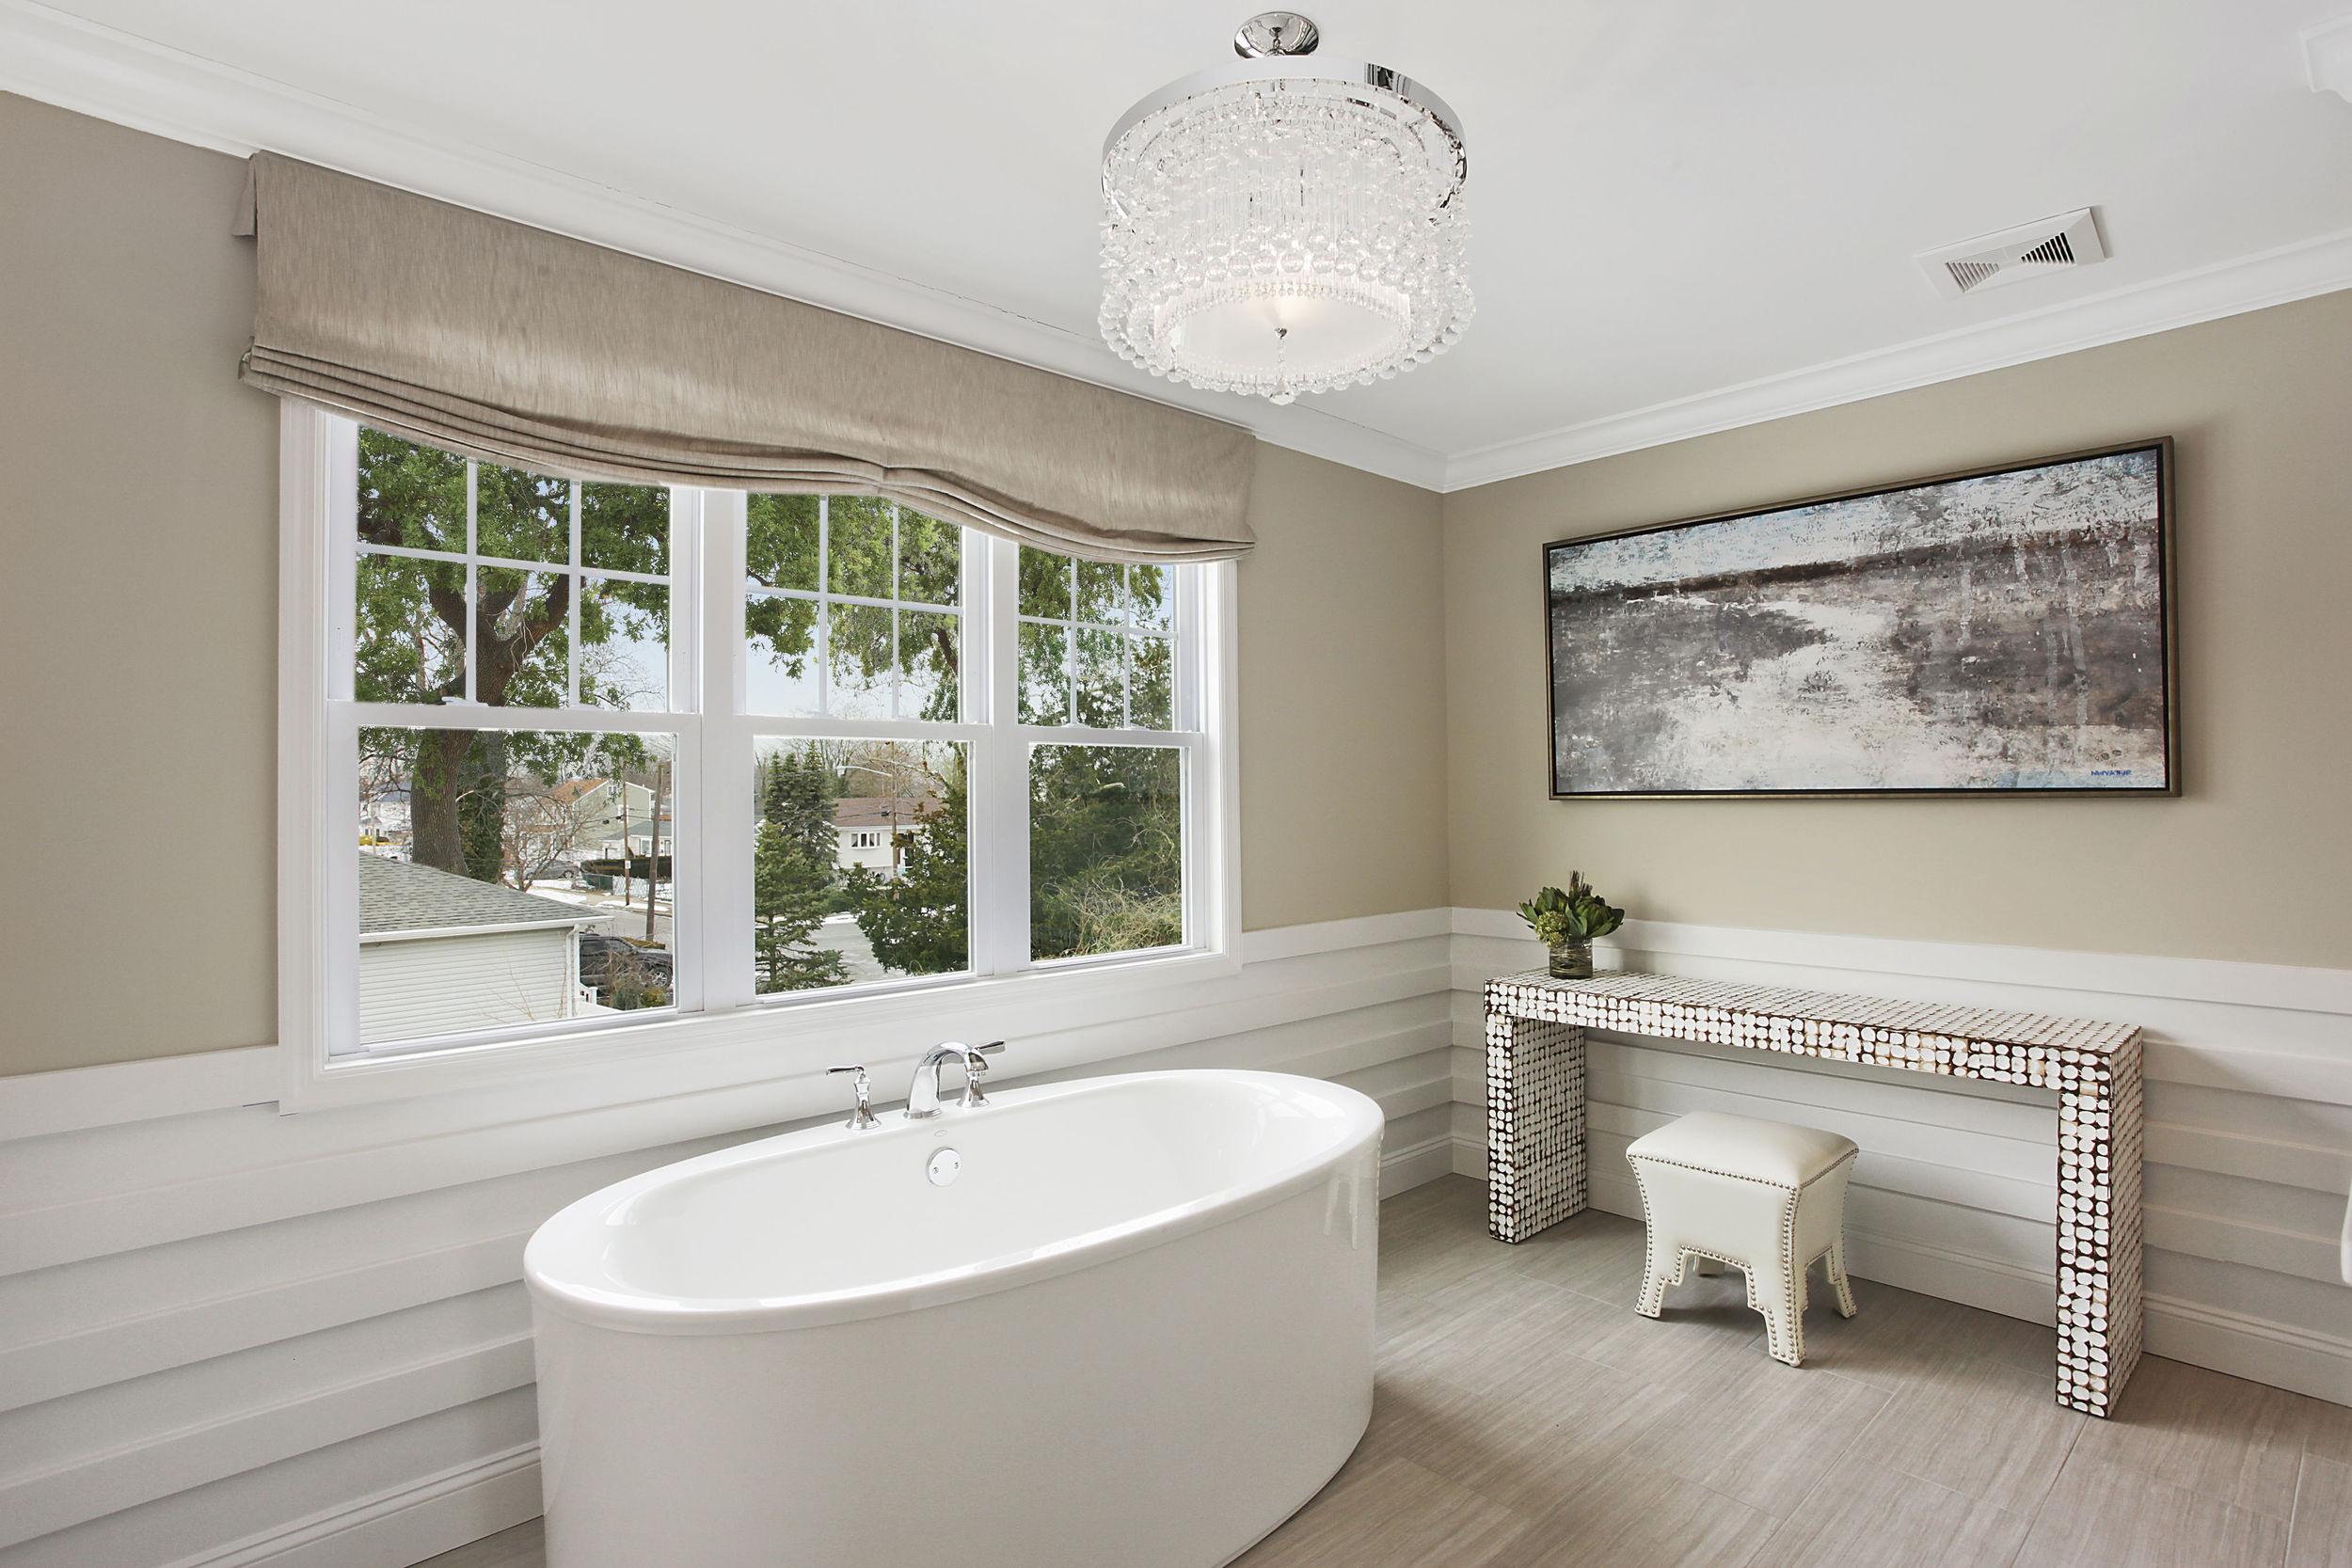 Six Simple Design Ideas to Create a Spa-Like Bathroom ... on Bathroom Model Design  id=85368